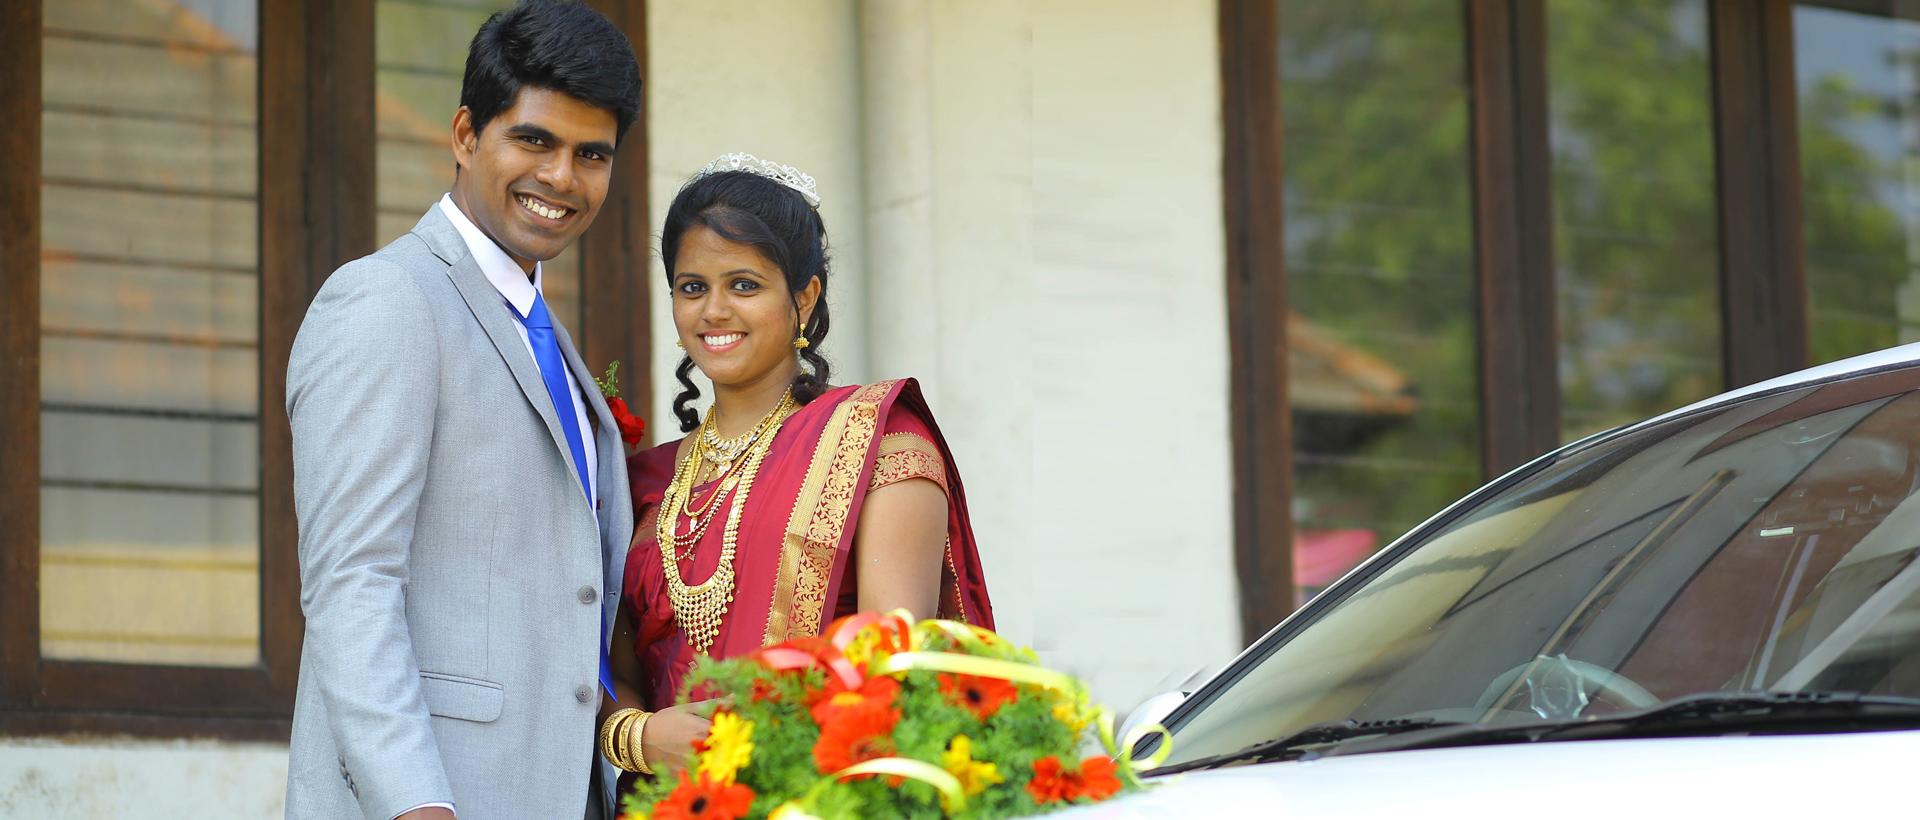 Latin Matrimonial - Kerala Catholic Christian Matrimony Network by